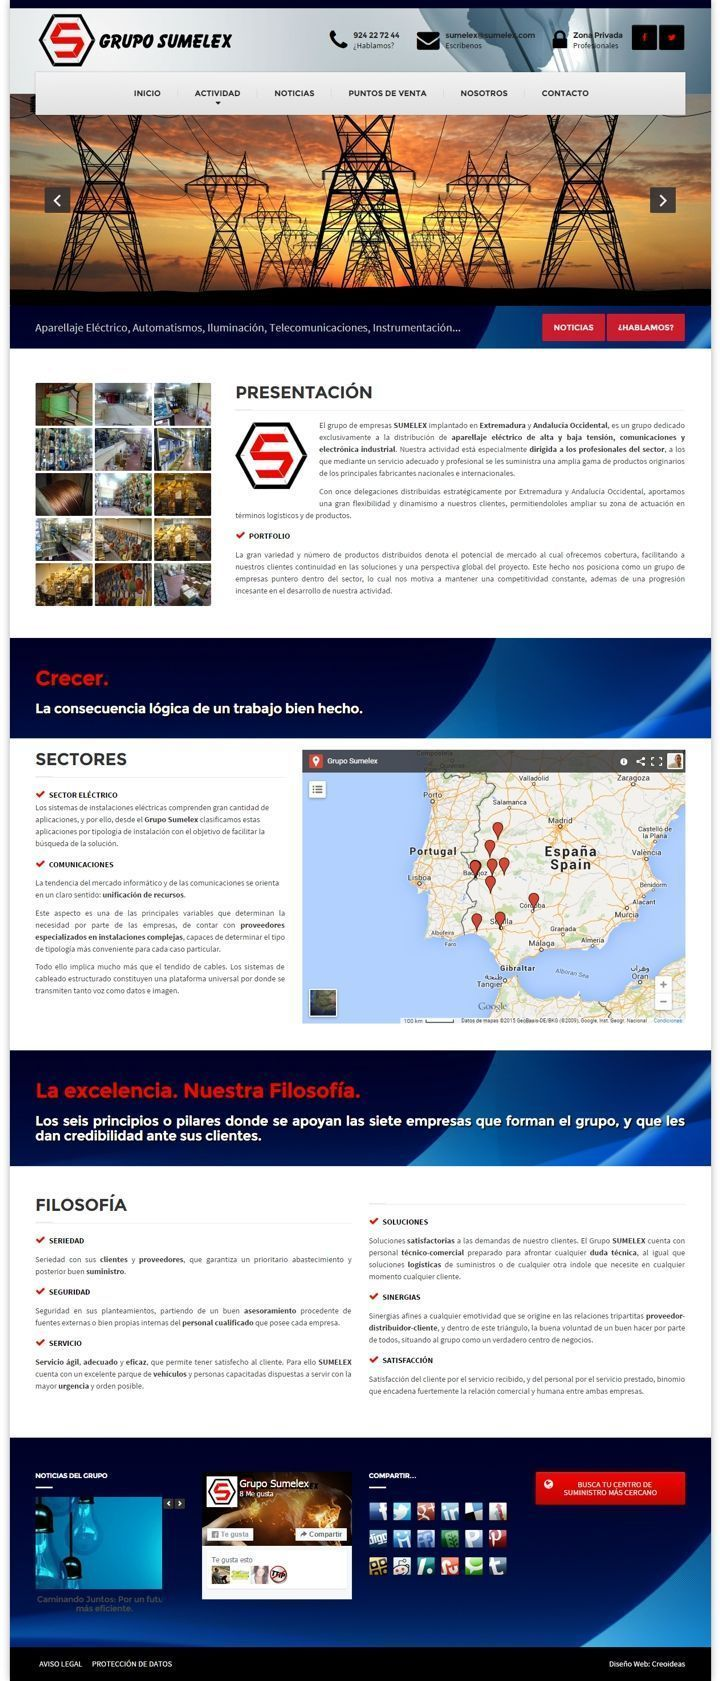 Grupo Sumelex Suministro de material eléctrico para Profesionales - Badajoz